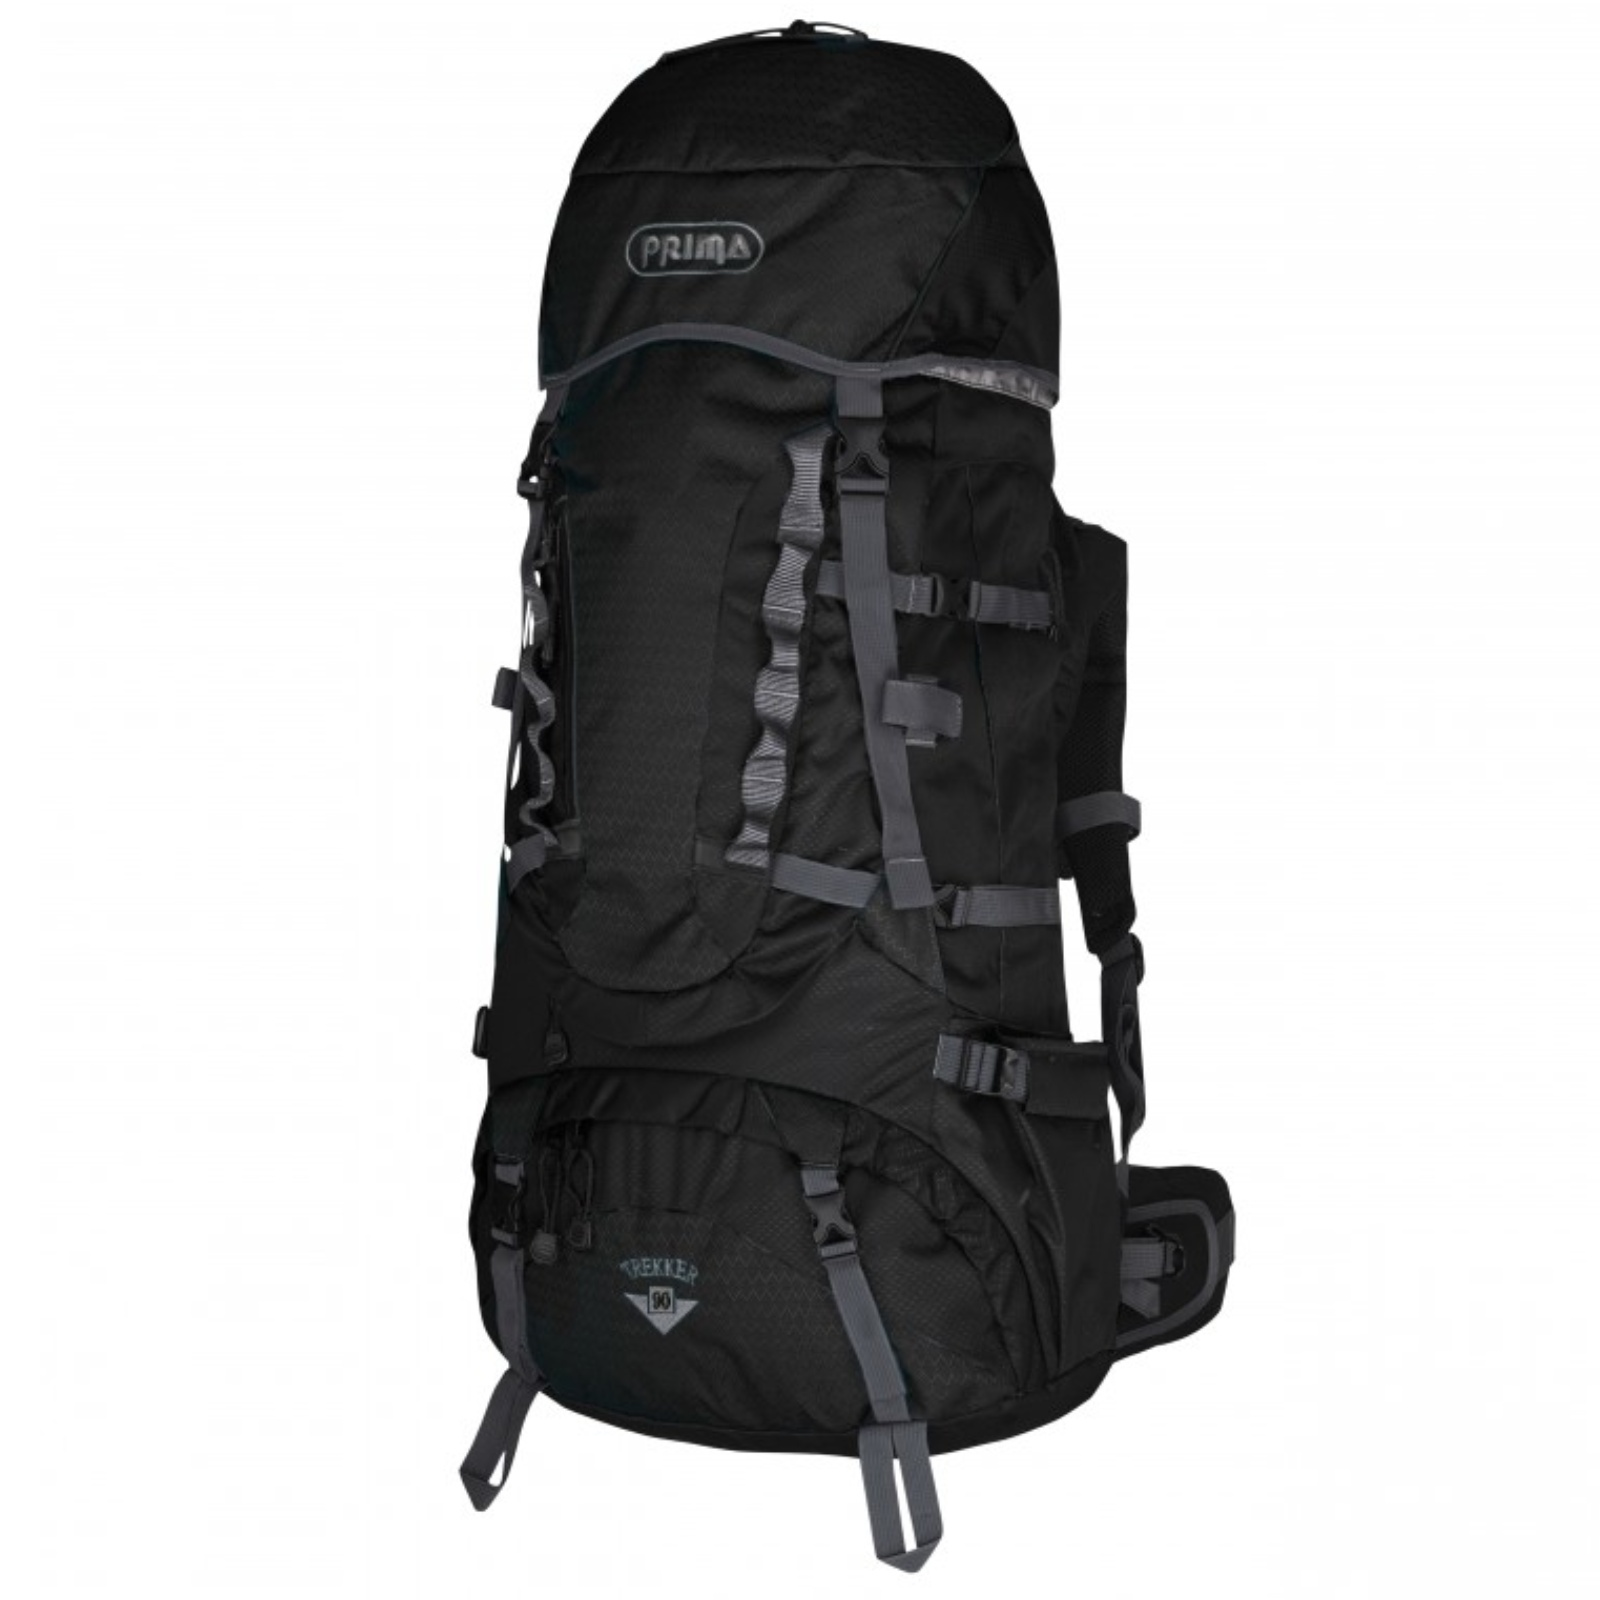 Batoh PRIMA Trekker 90 - černý